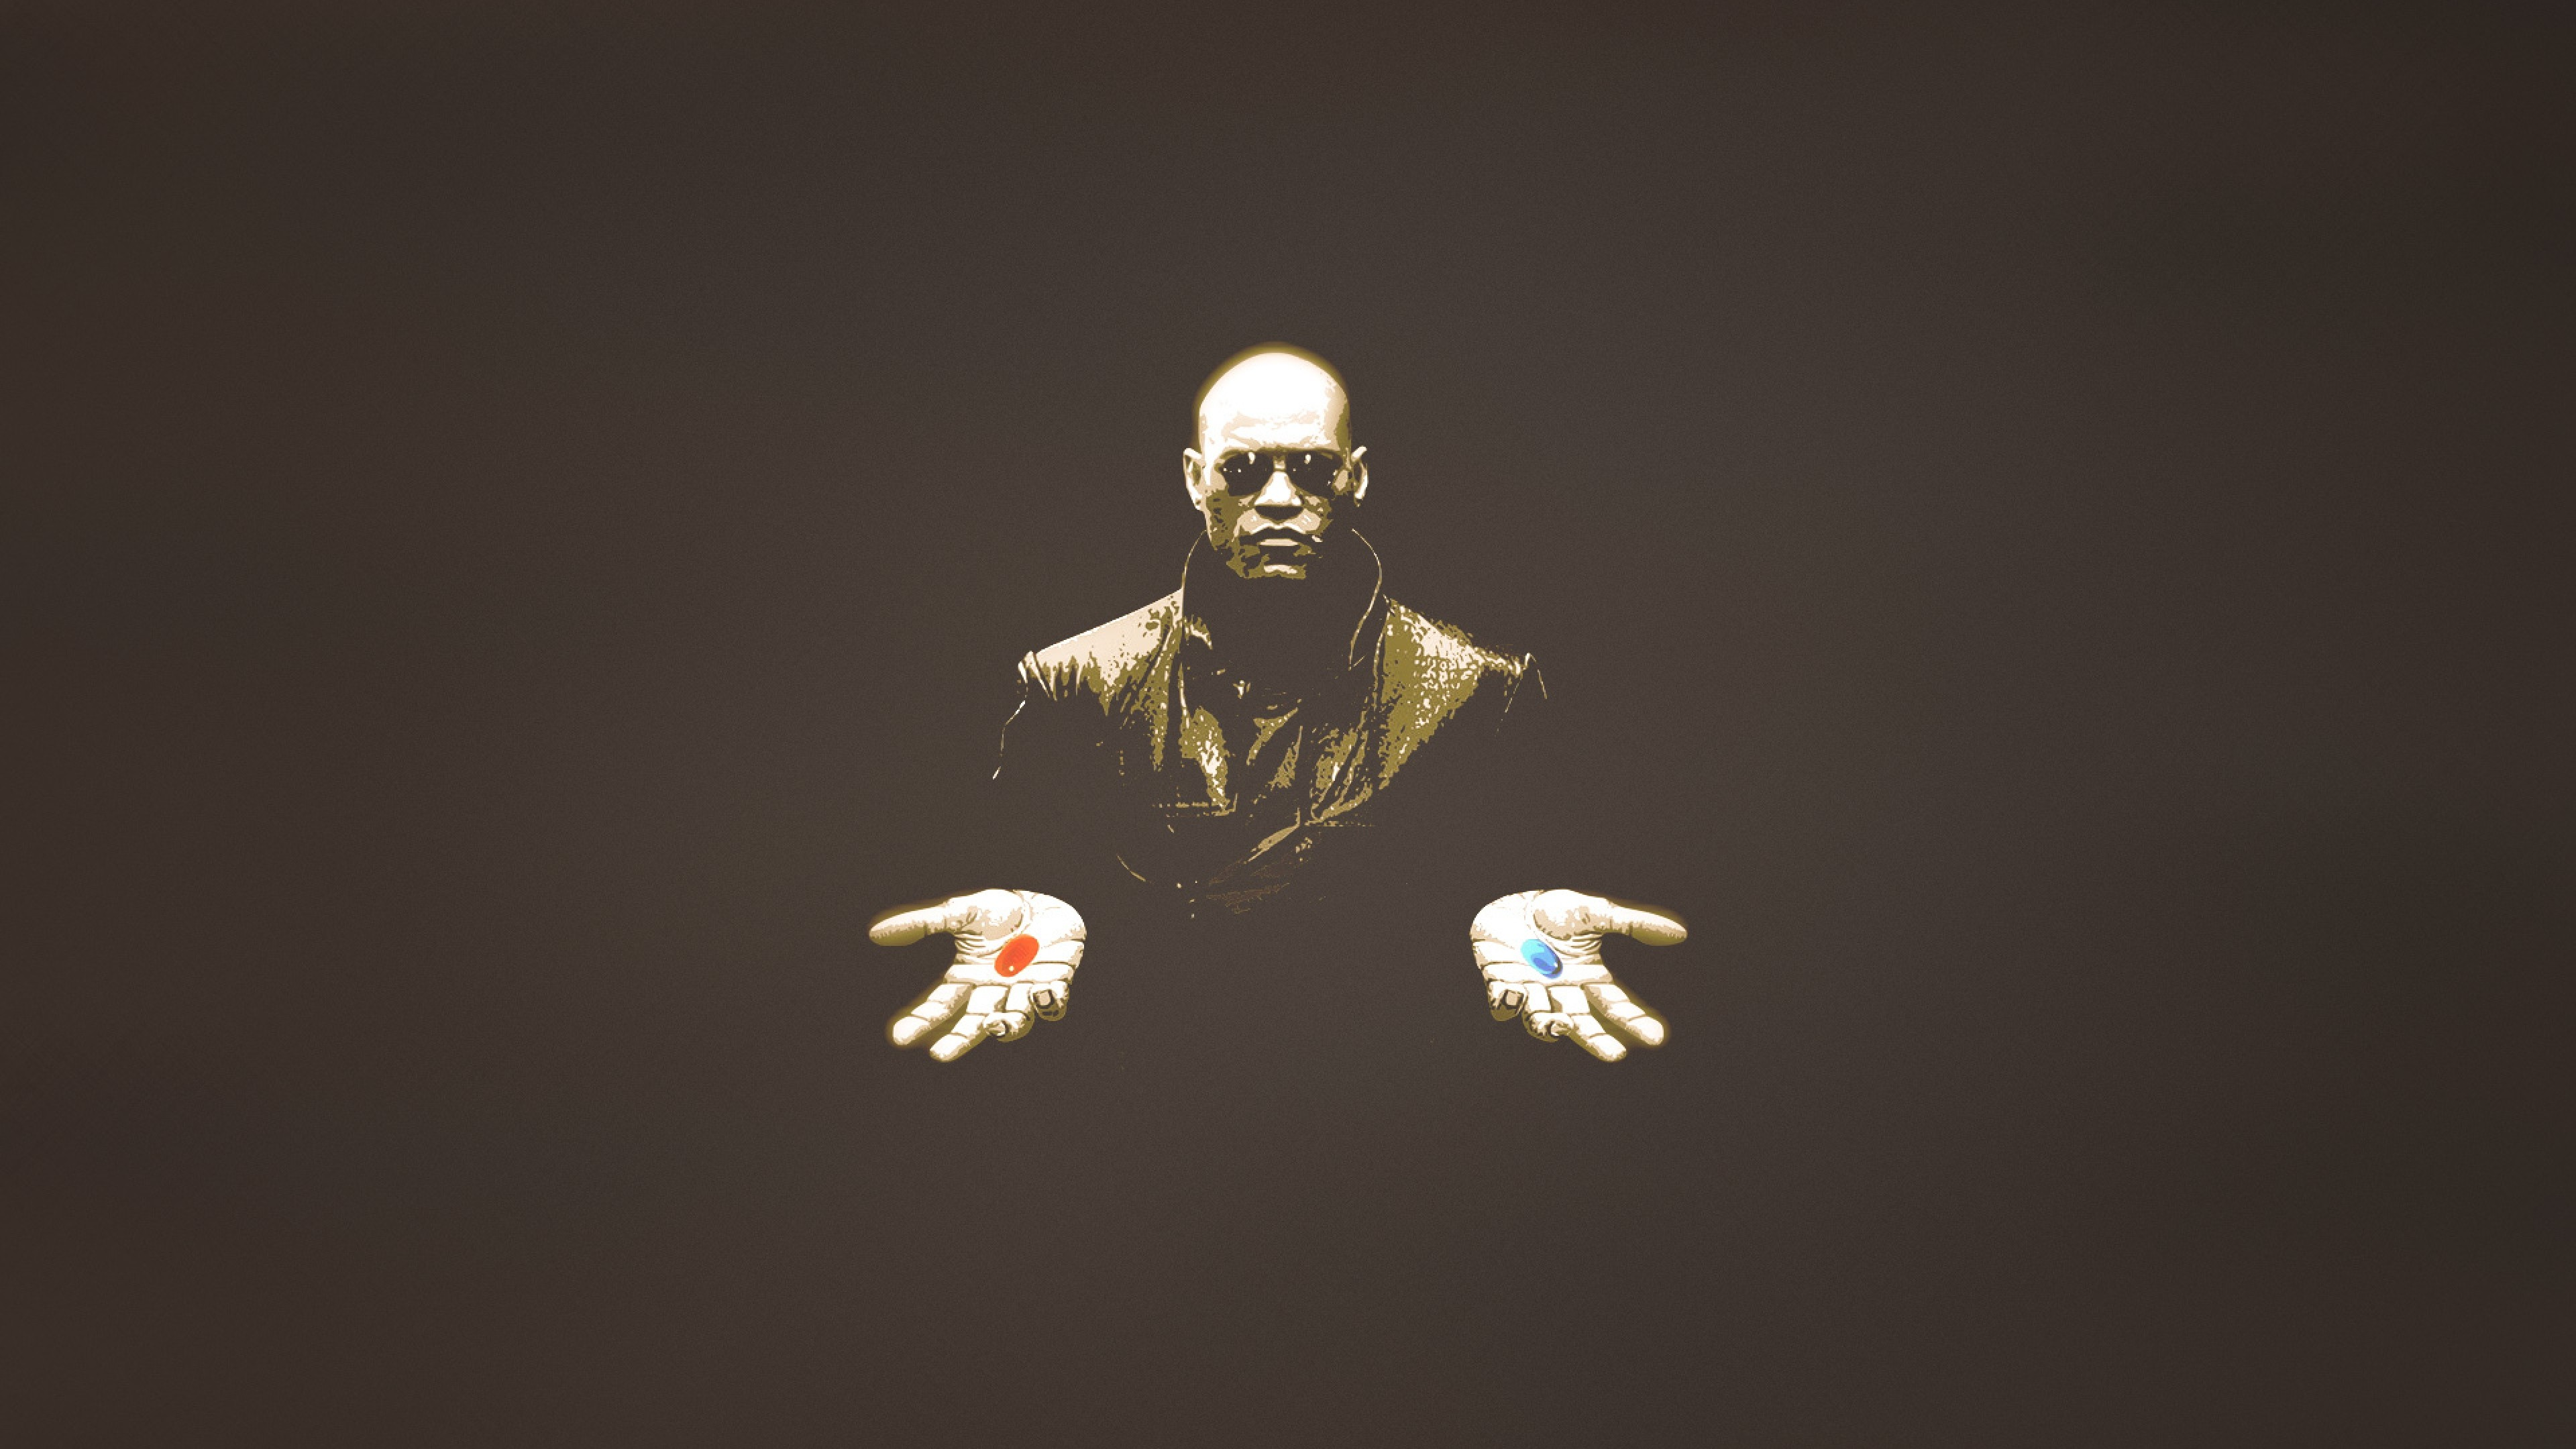 The Matrix wallpaper ·① Download free full HD backgrounds for desktop ...